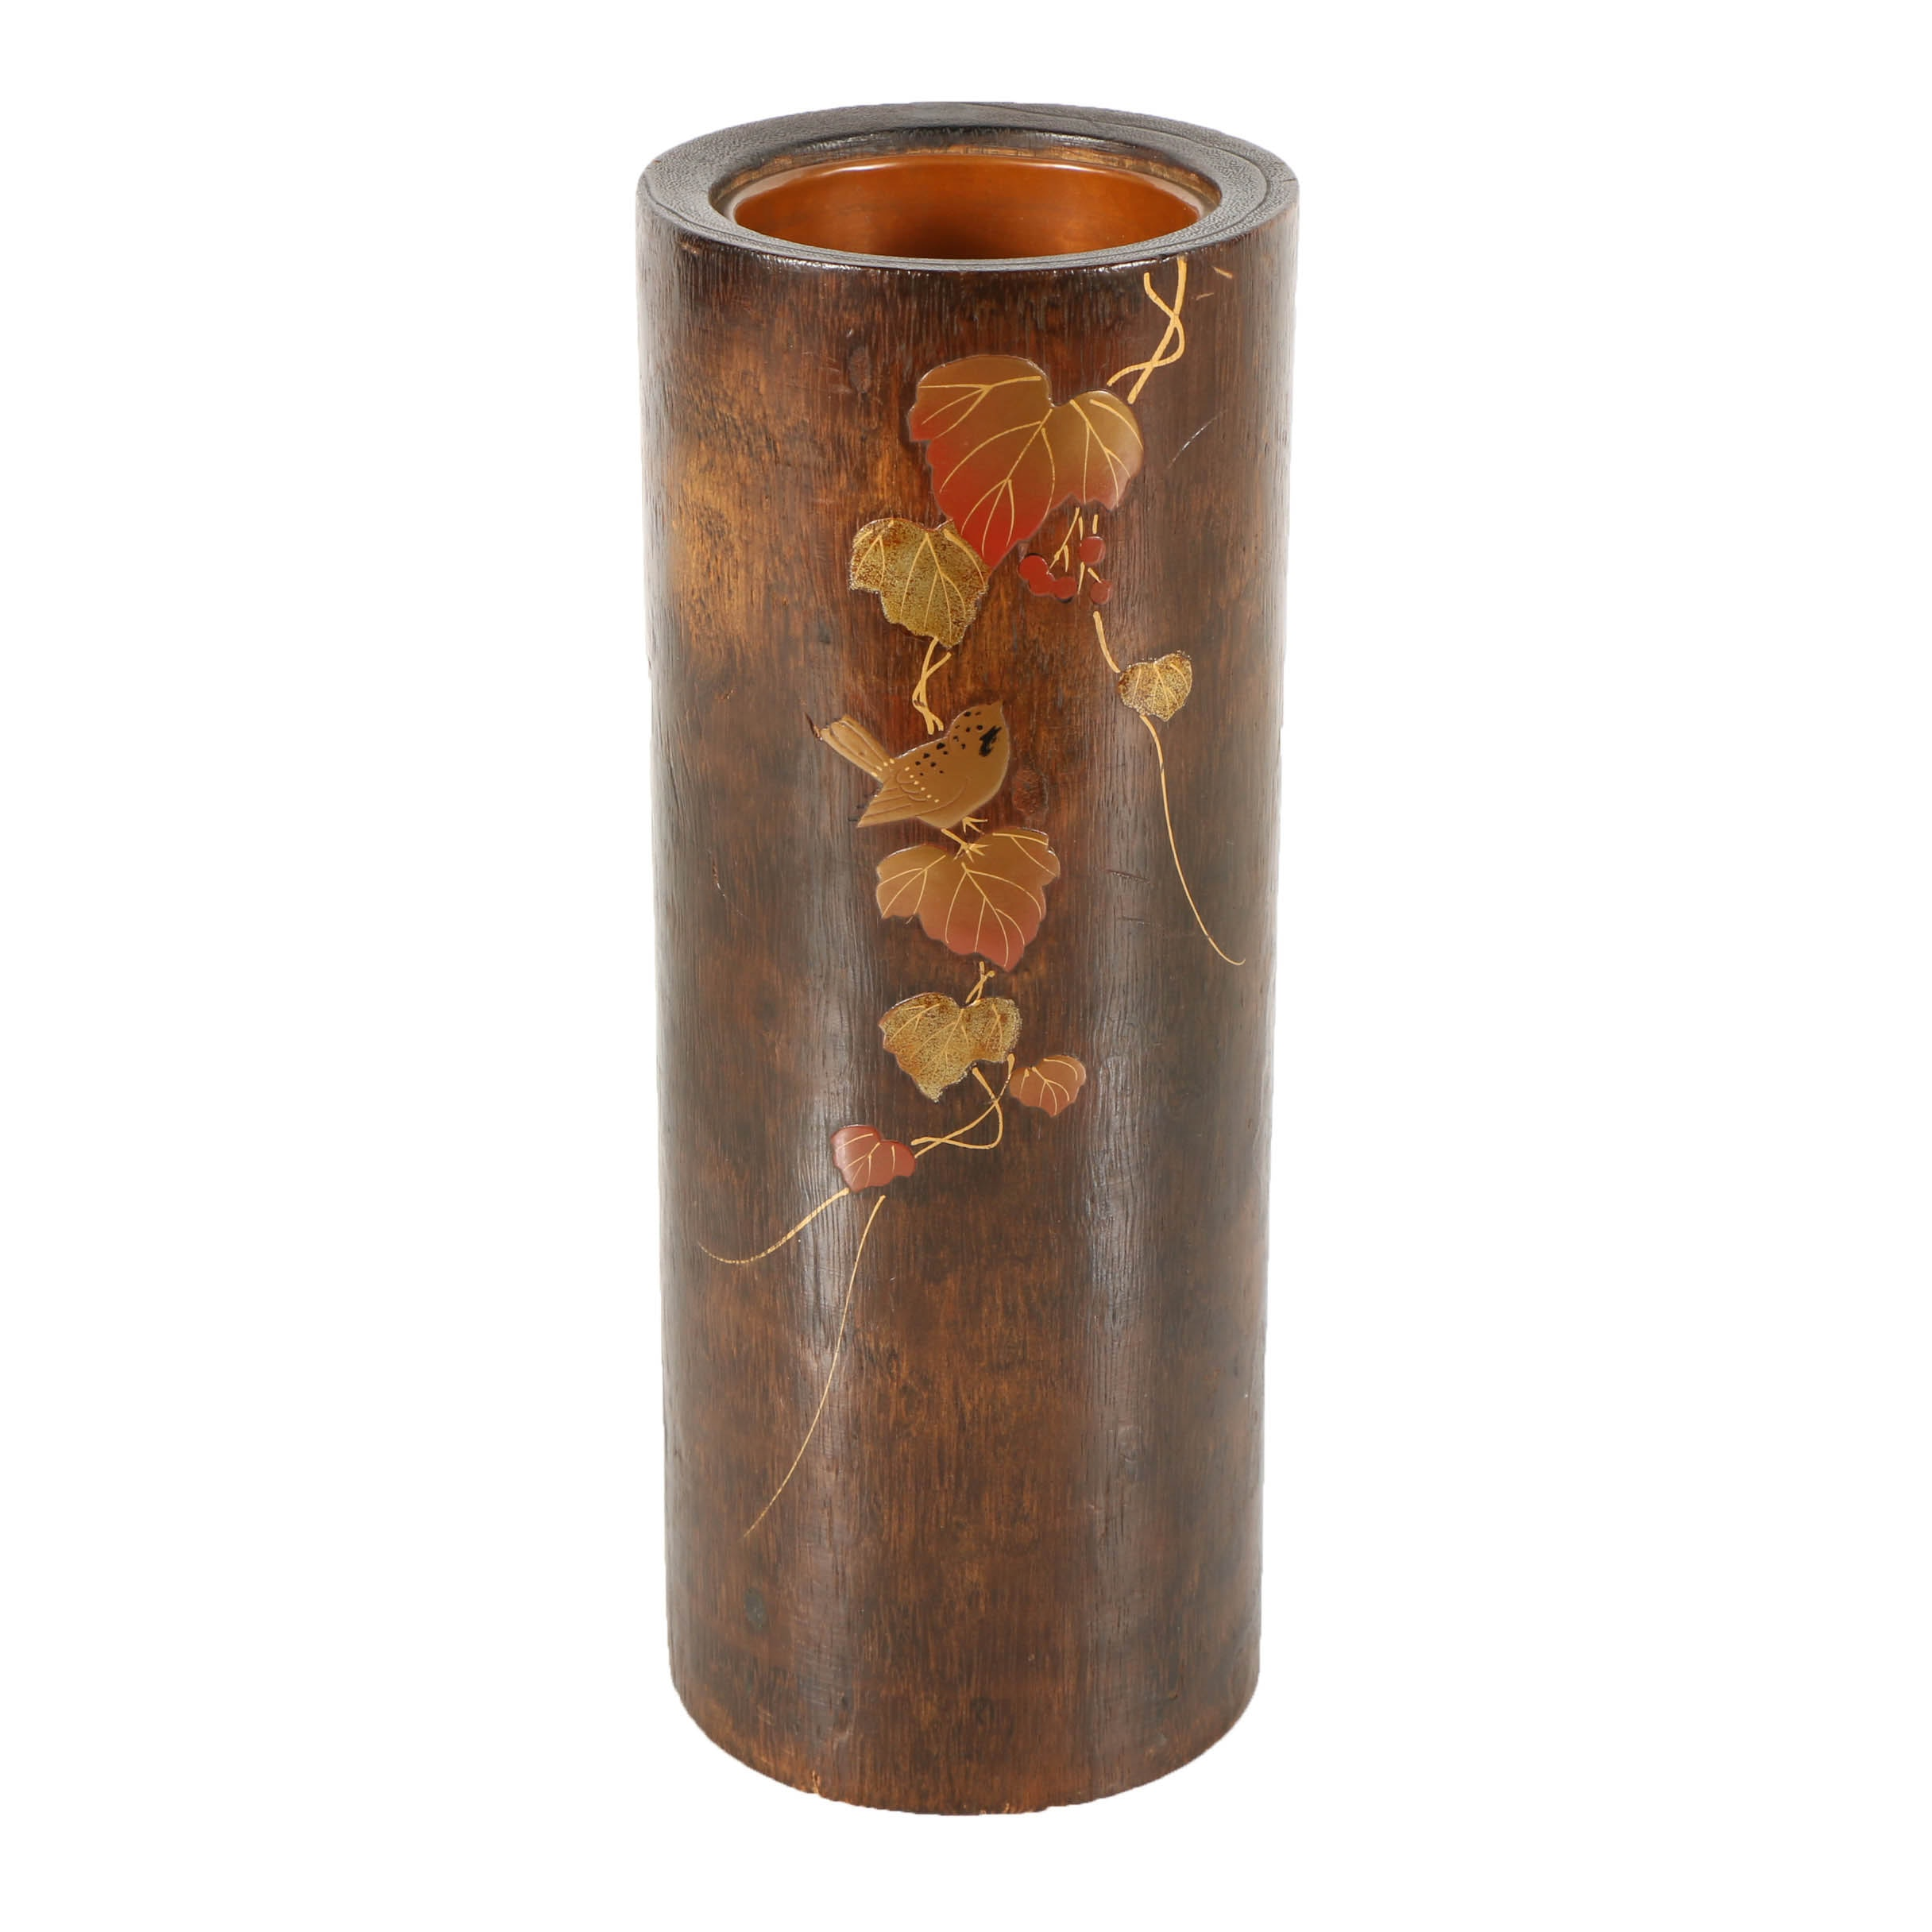 Japanese Wooden Vase with Bird Motif